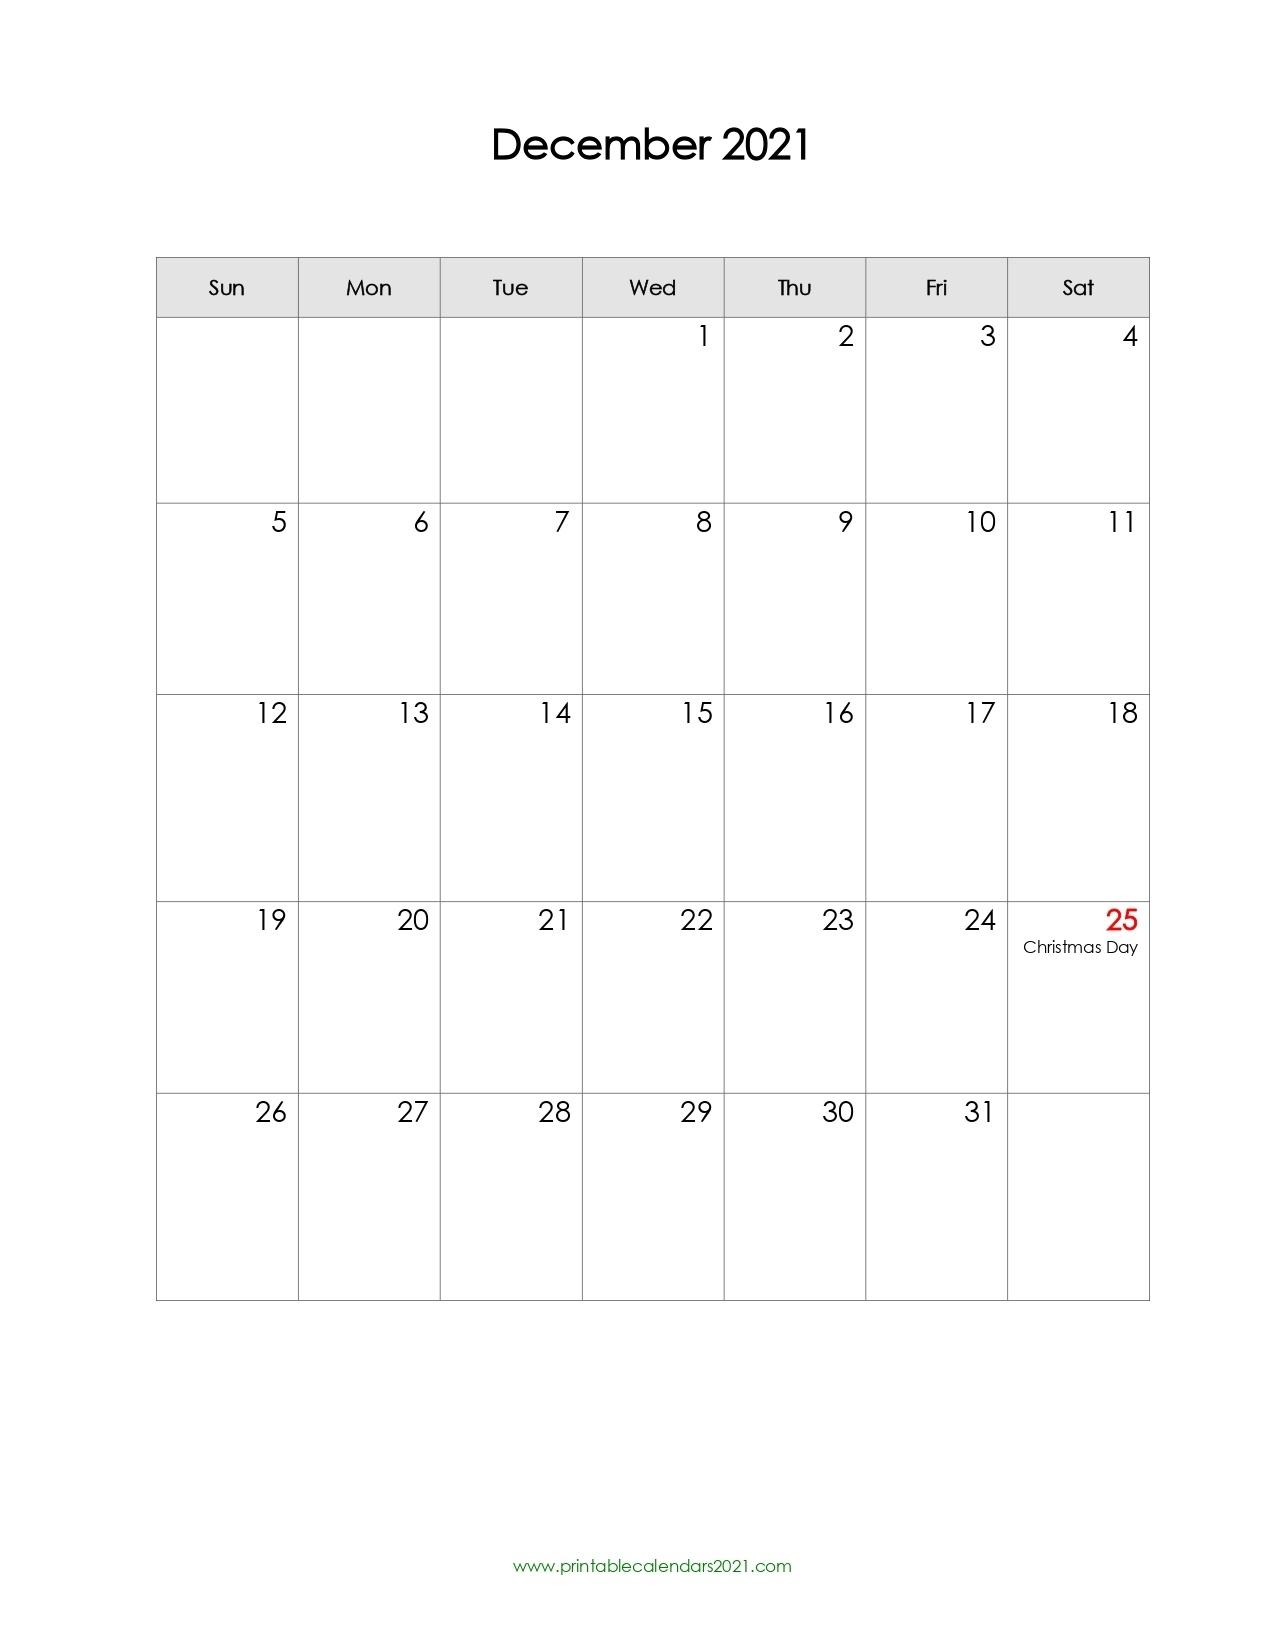 40+ December 2021 Calendar Printable, December 2021 Calendar Pdf Printable January Through December 2021 Calendar